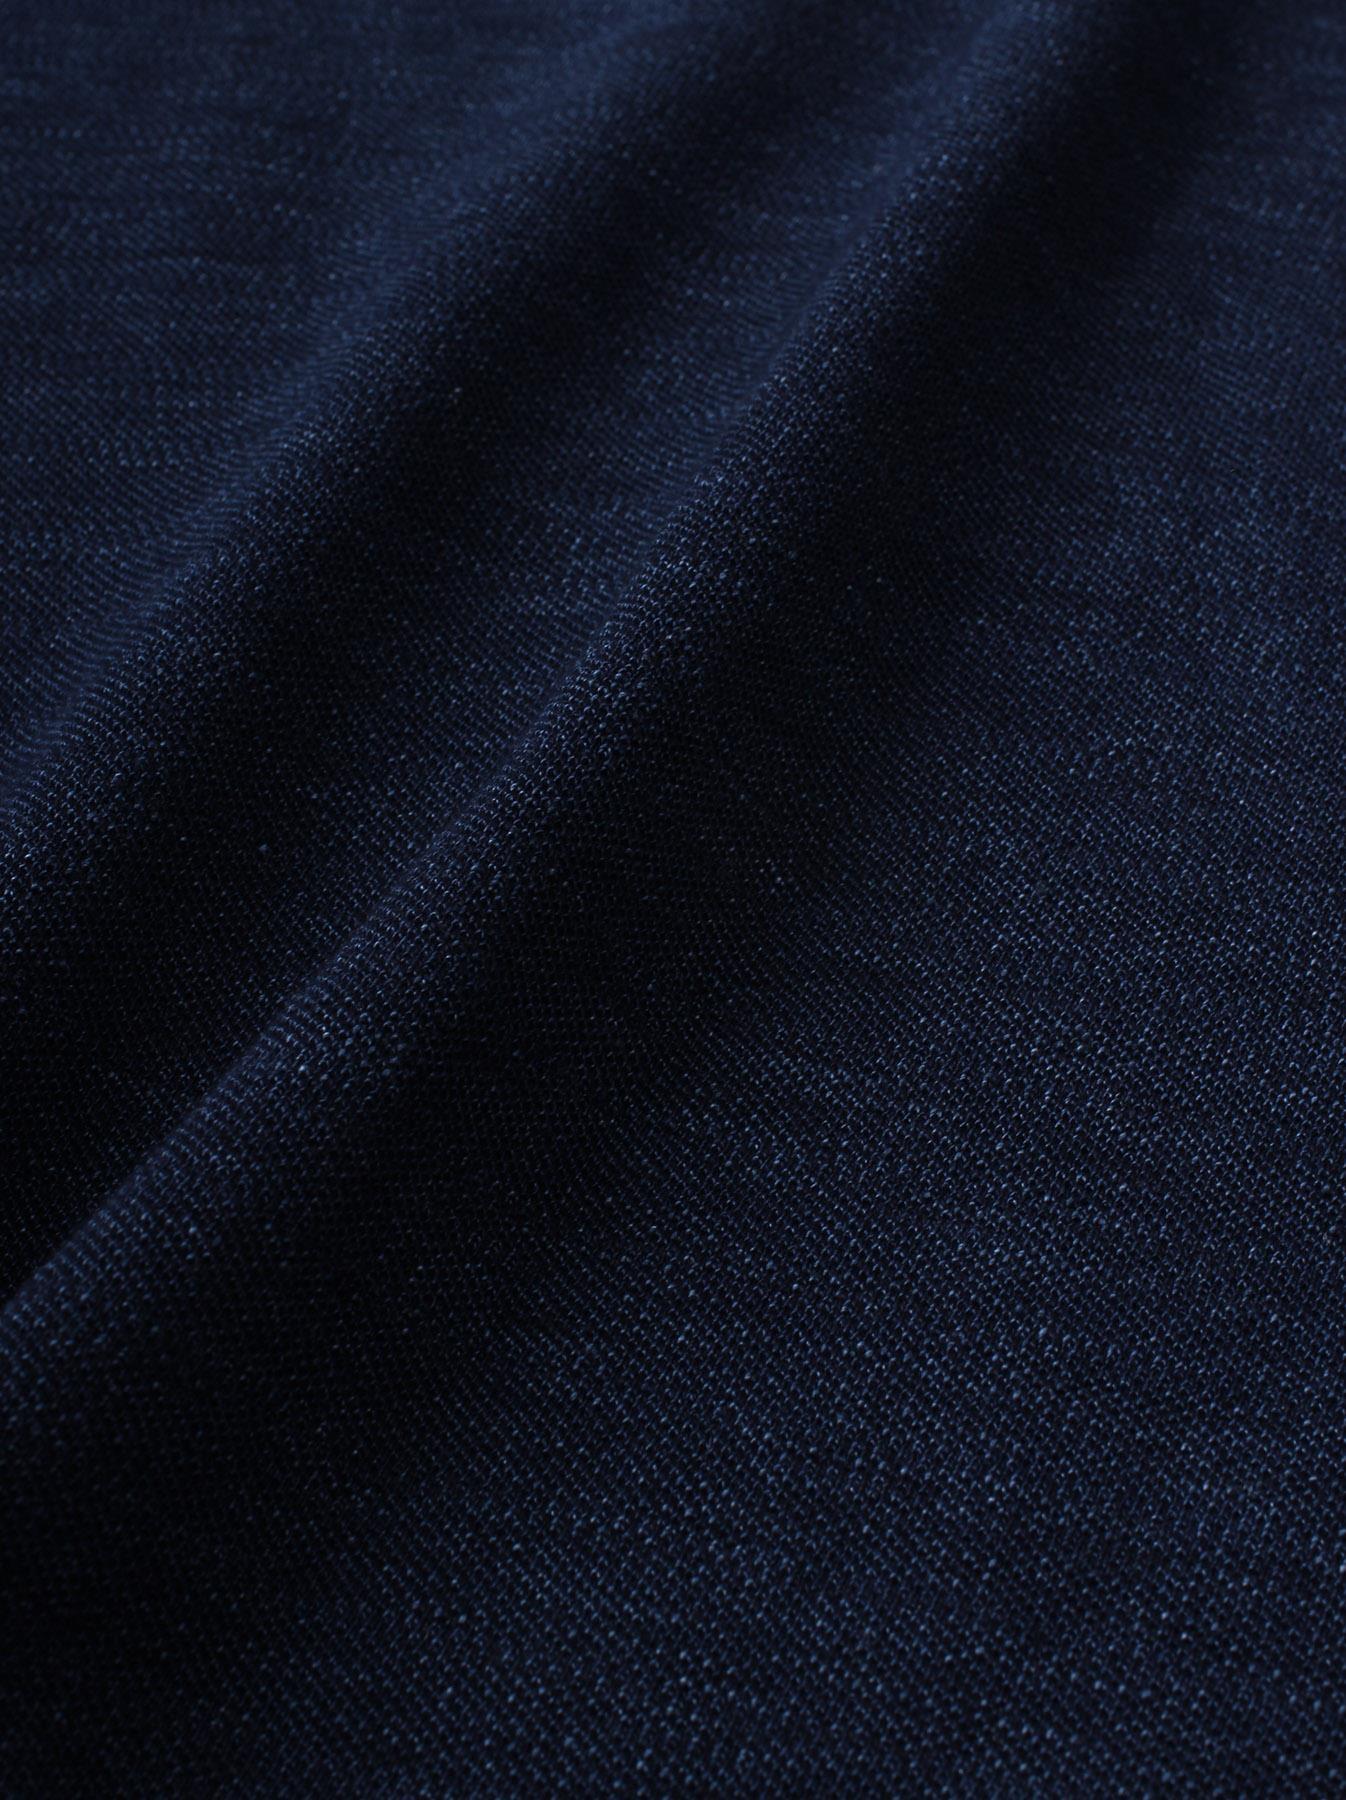 WH Indigo Ultimate Pique T-shirt-8